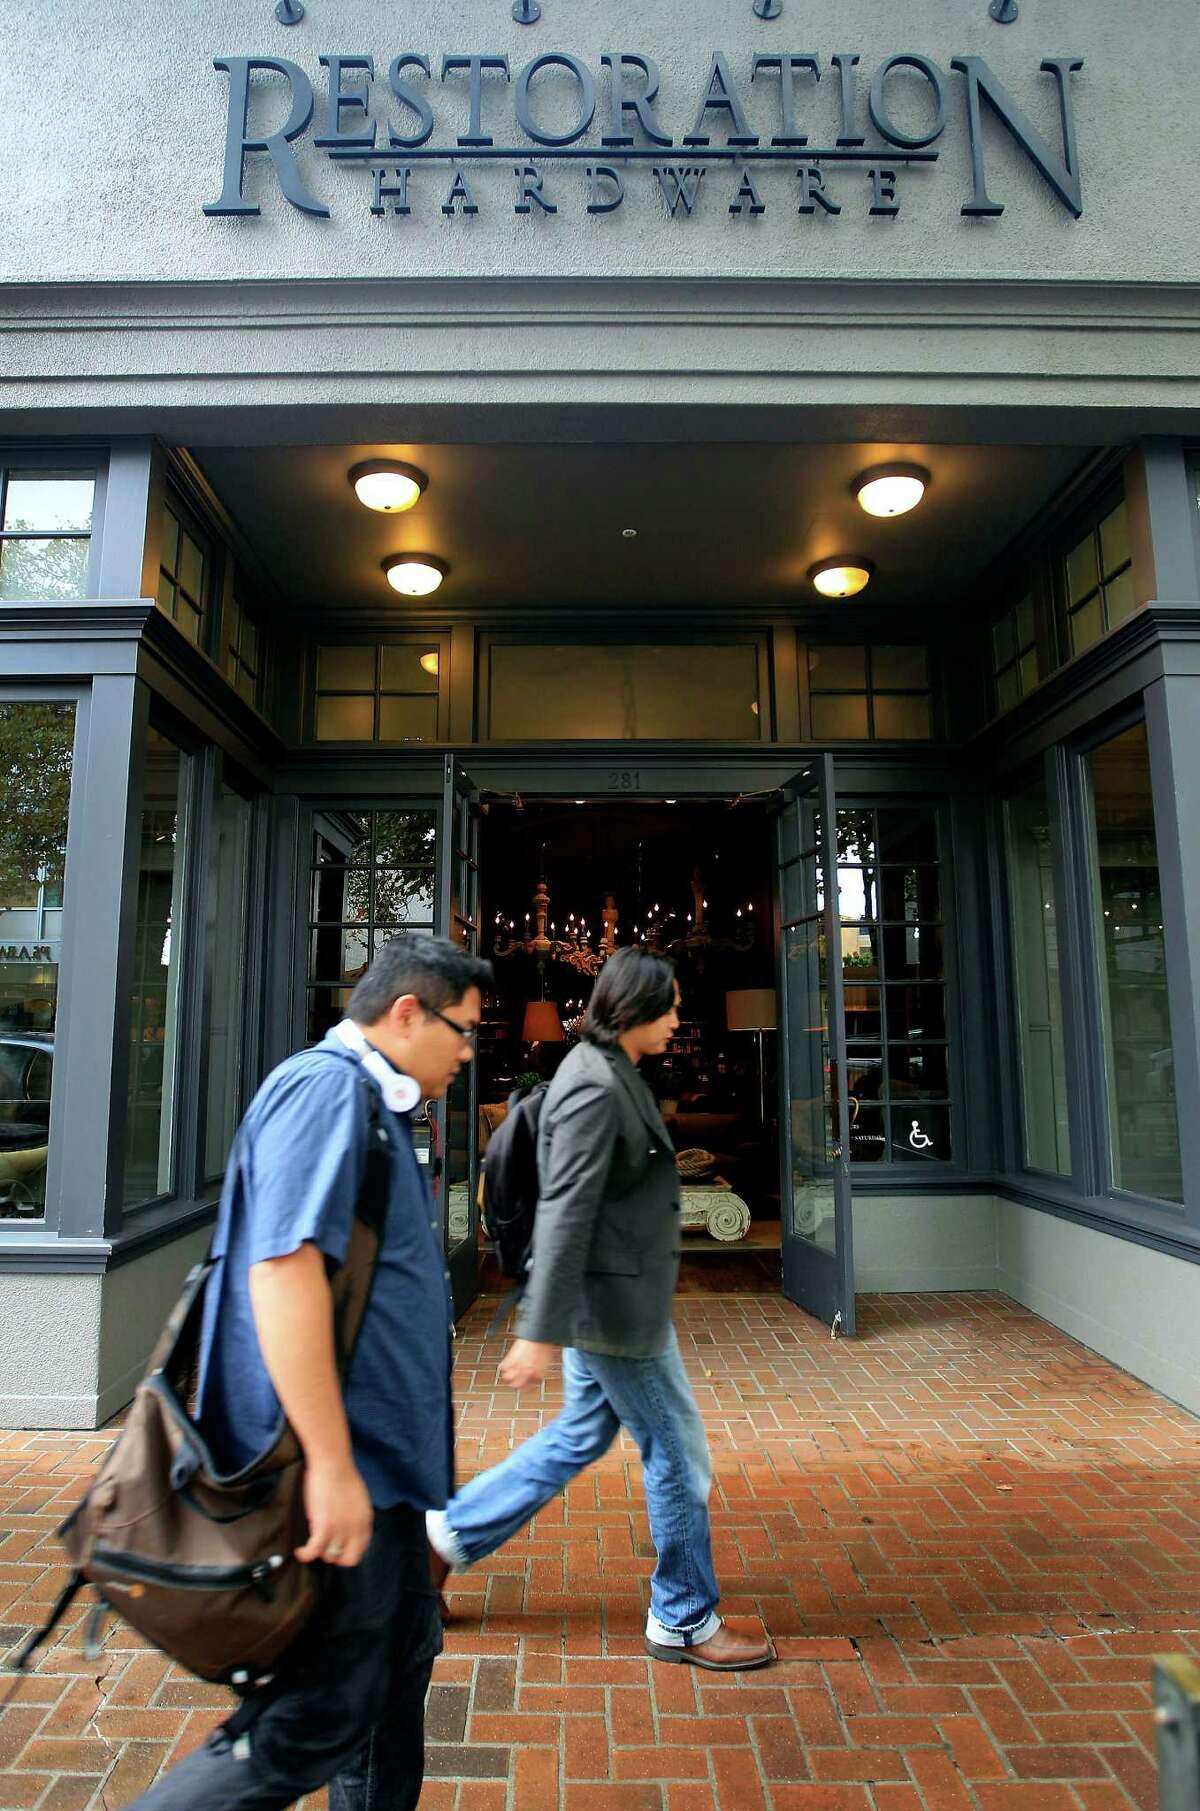 Pedestrians pass a Restoration Hardware Inc. store in Palo Alto, California, California, U.S., on Tuesday, Oct. 11, 2011.